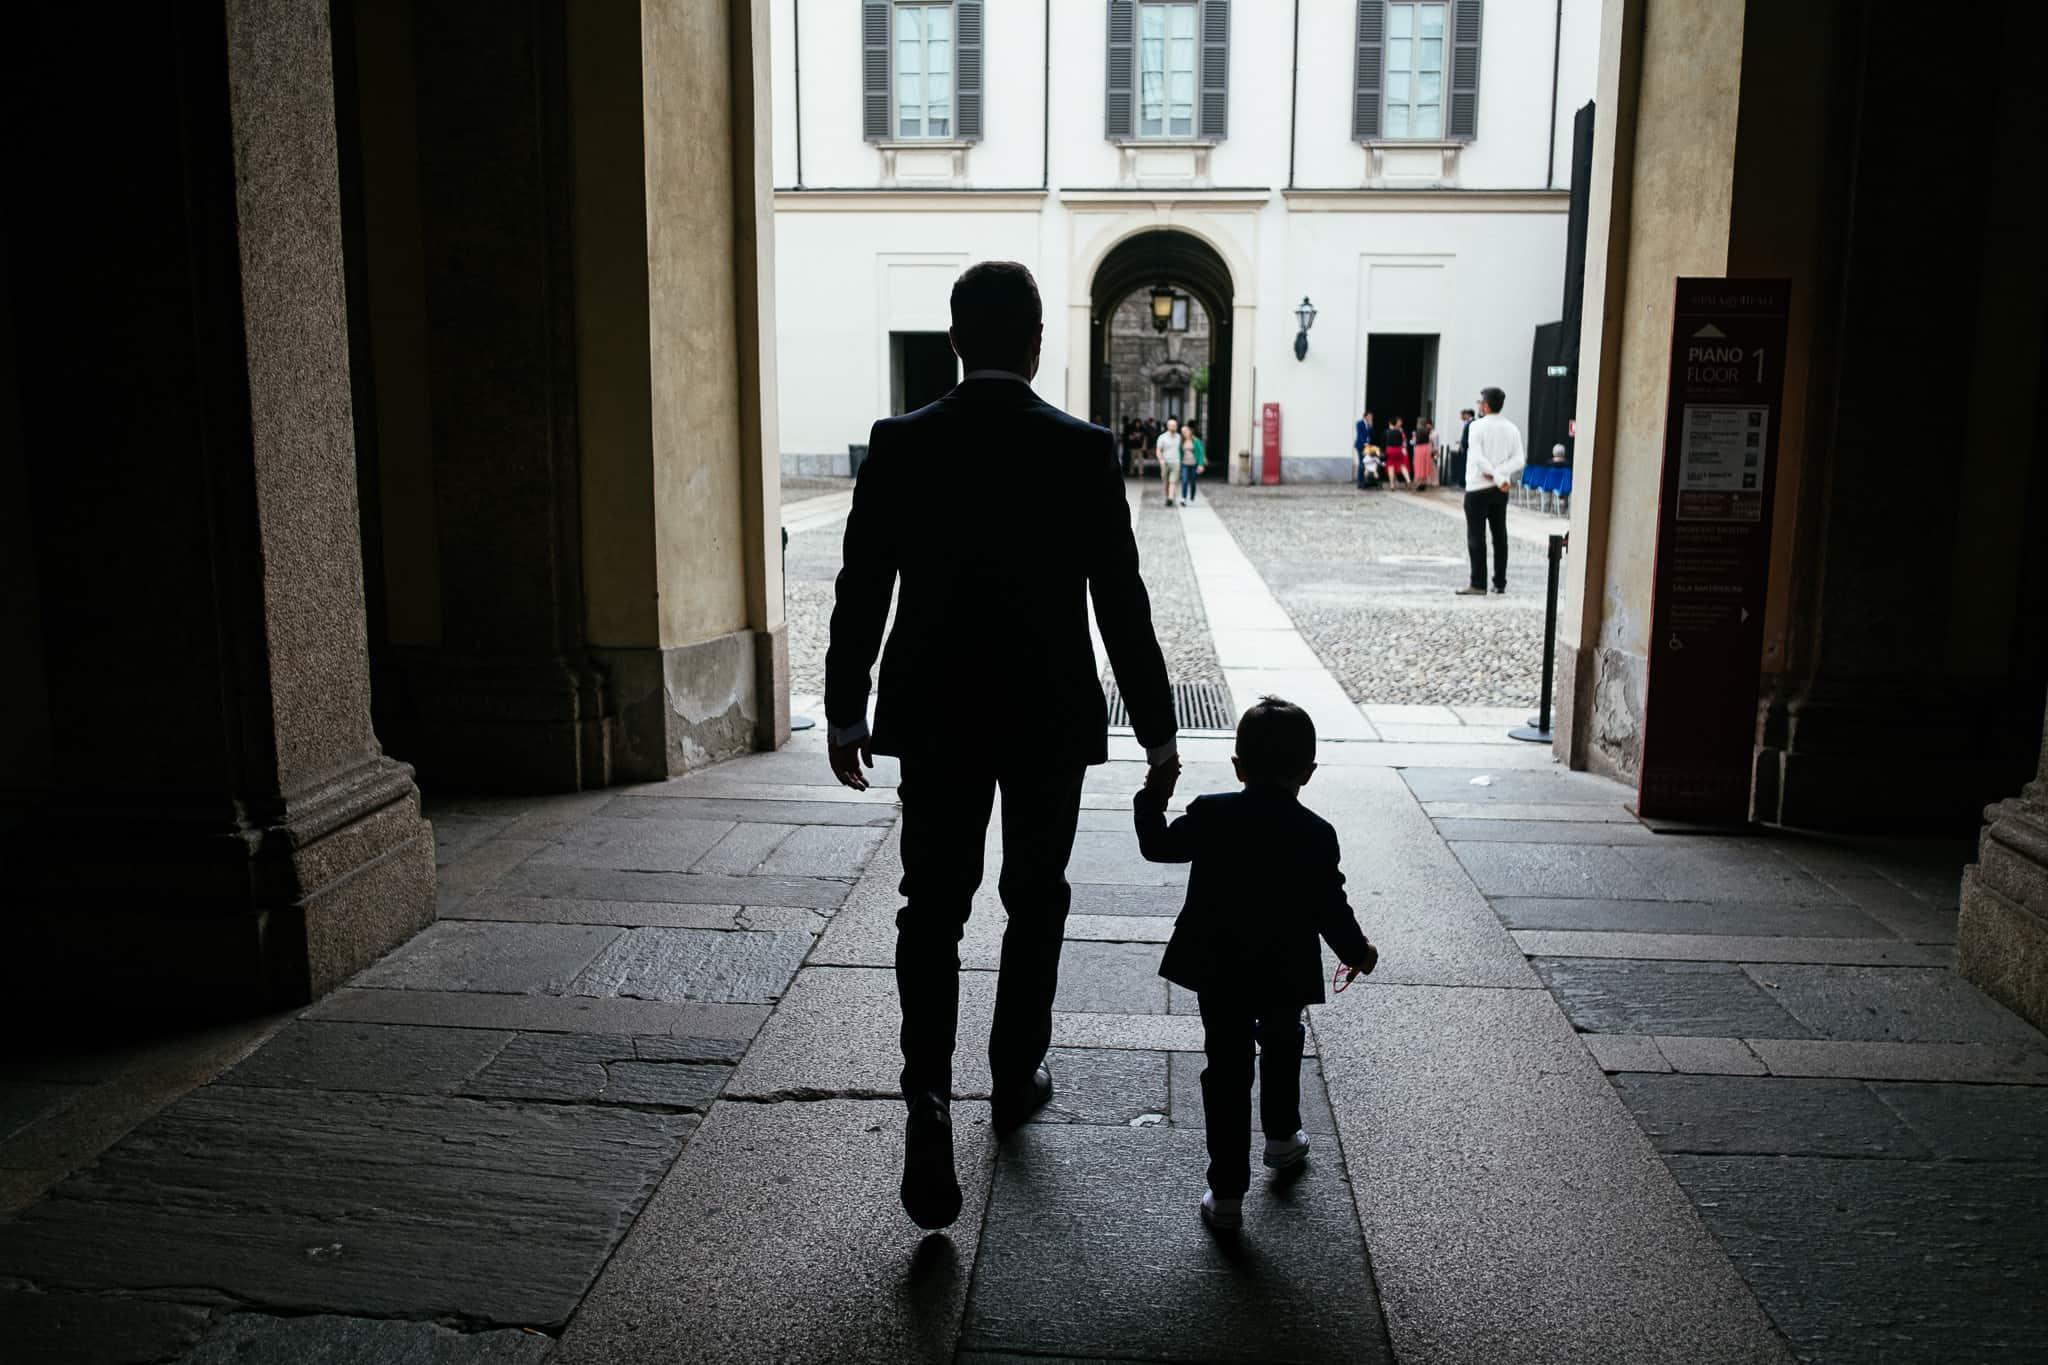 matrimonio Canter Milano San siro Luca rossi wedding reportage 0025